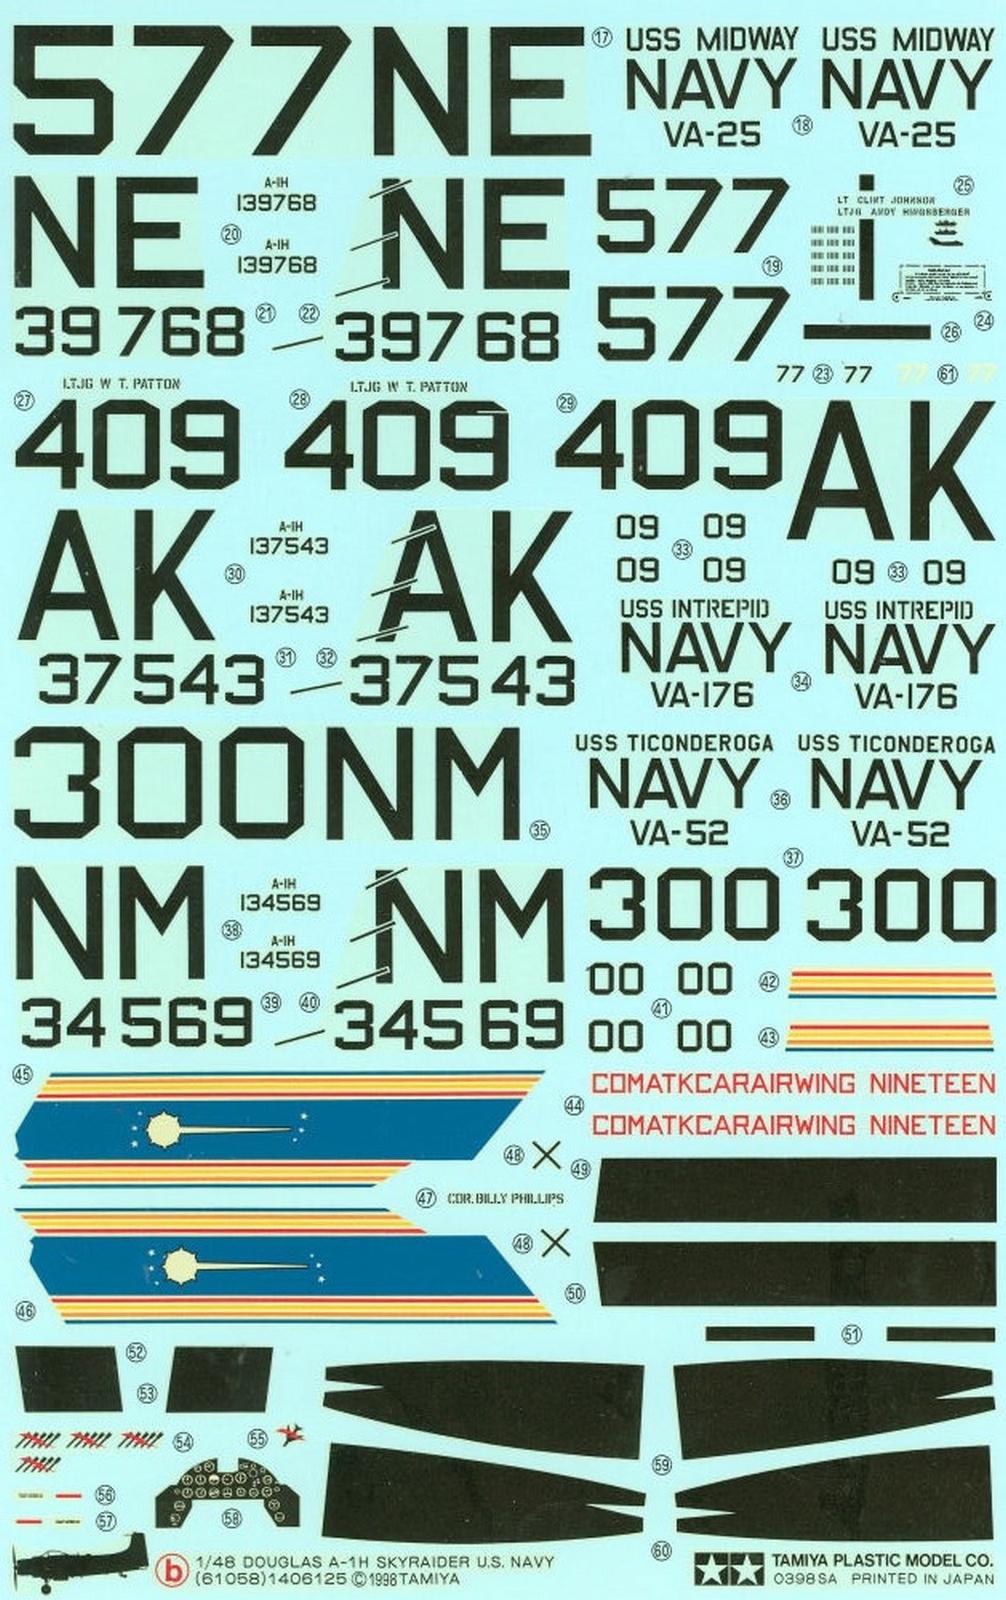 AD-4 Skyraider n°123895 /SFERMA 110 de l'EC 3/20  (Tamiya 1/48) 1025